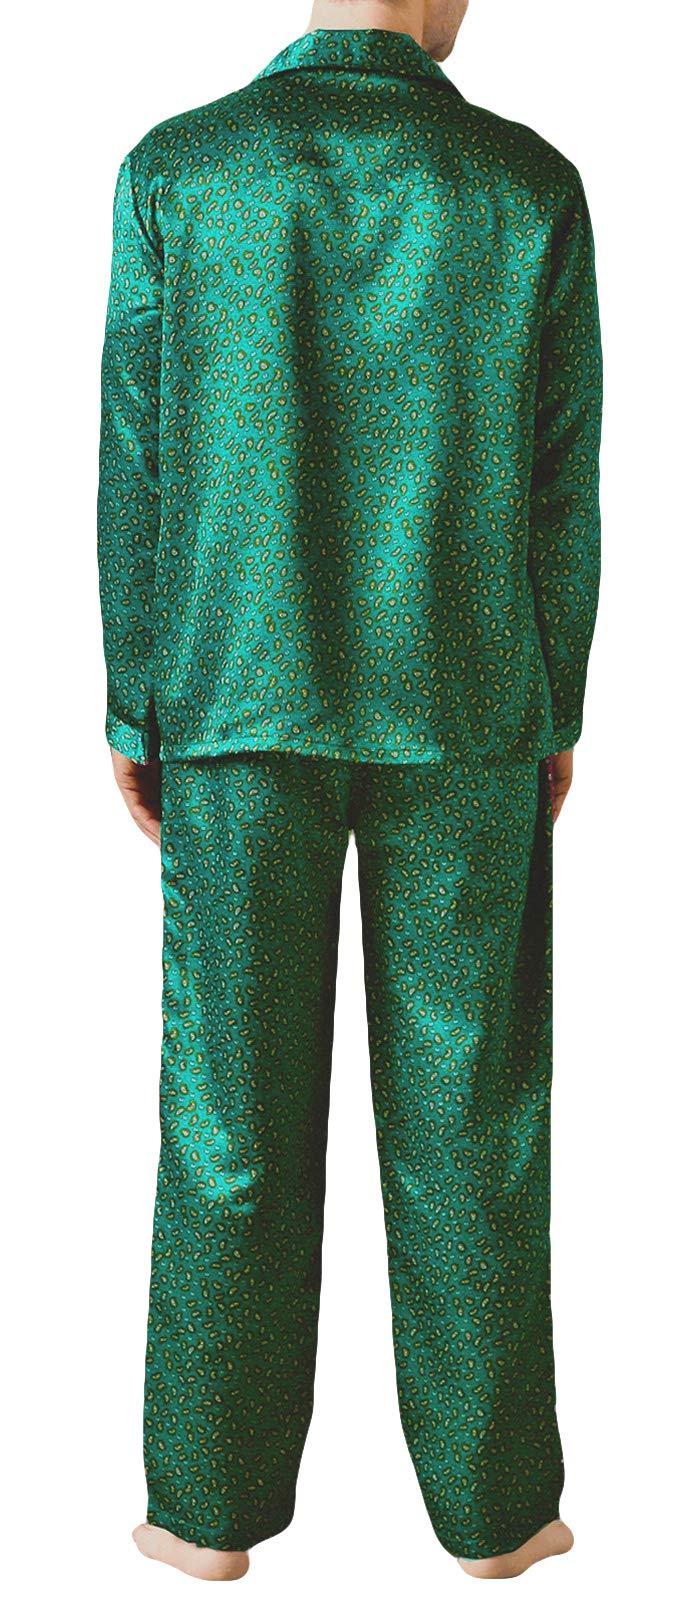 Gaffer Mens Pyjamas Set Satin Silk Nightwear Long Sleeve Top Pjs Lounge Pants Classic Sleepwear Big Sizes UK M to 3XL